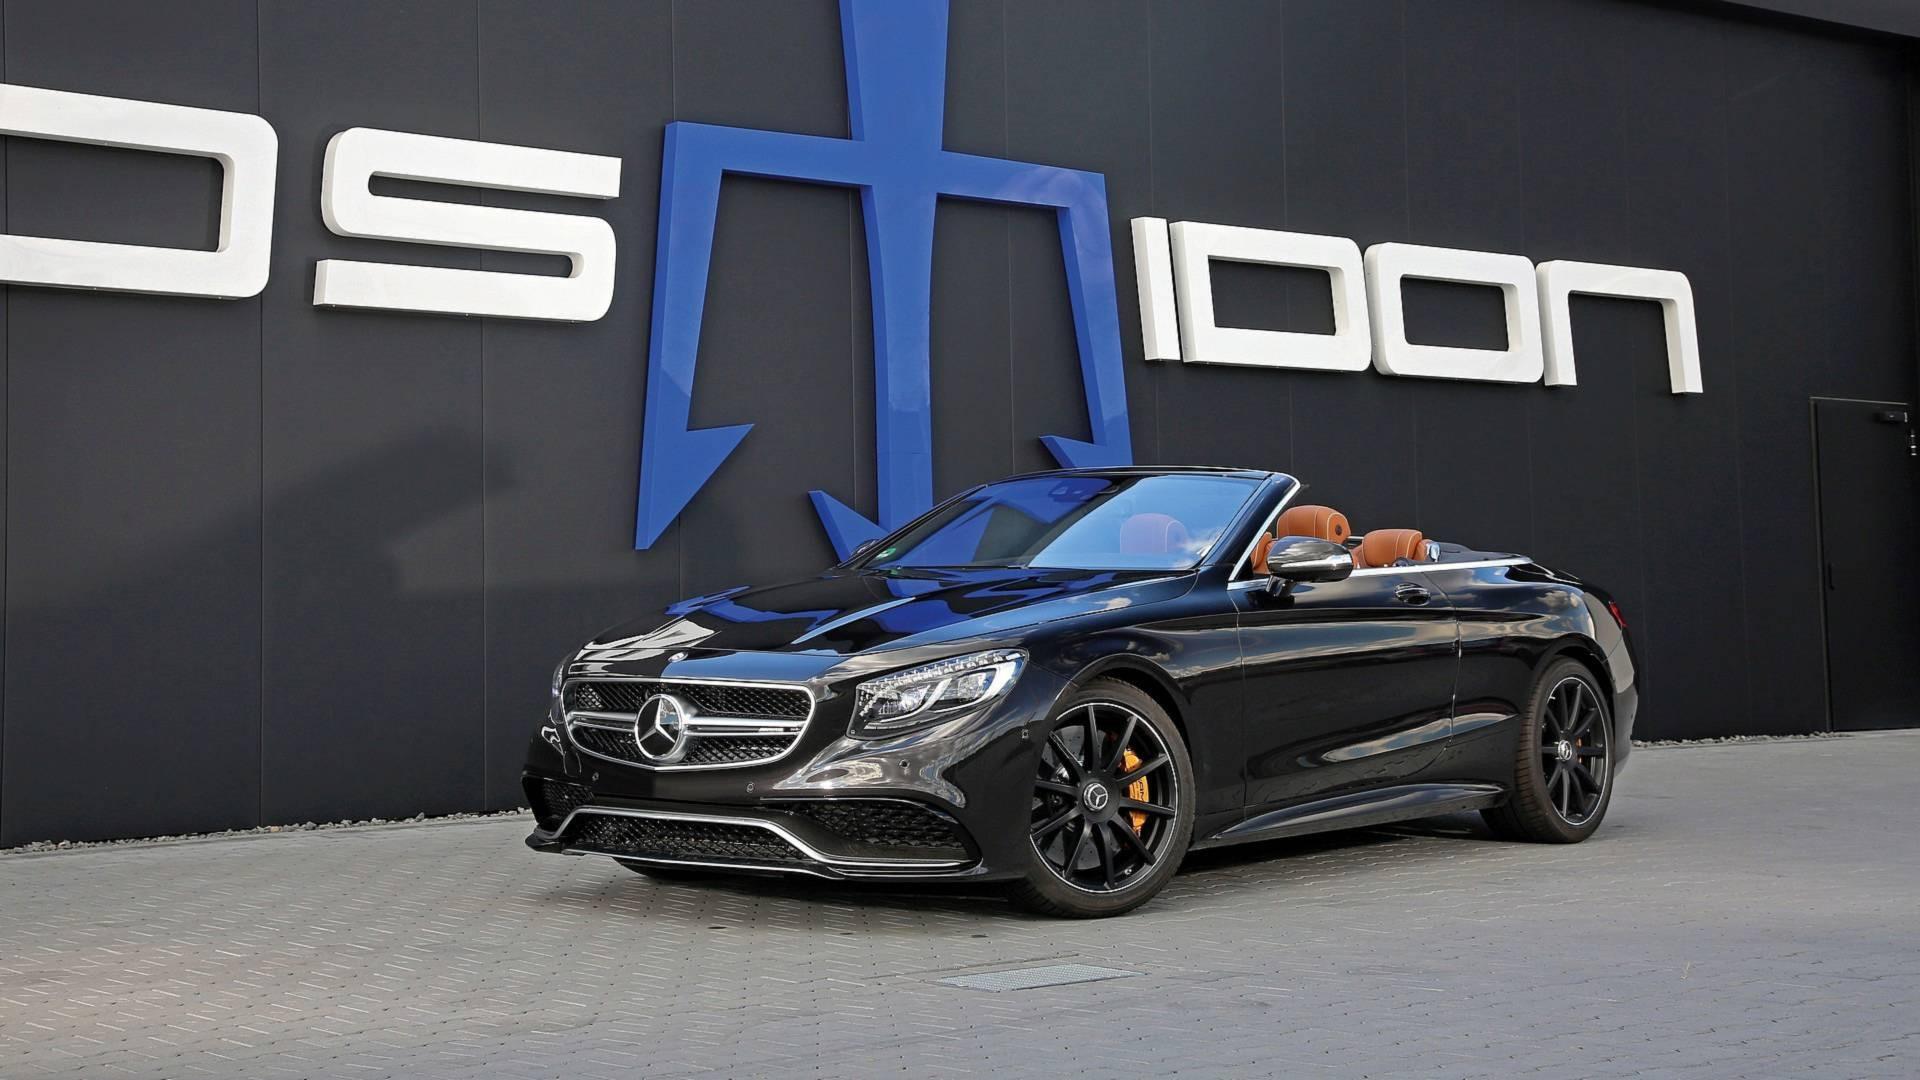 Mercedes-AMG S63 Cabriolet độ 1.000 mã lực đầy hấp dẫn